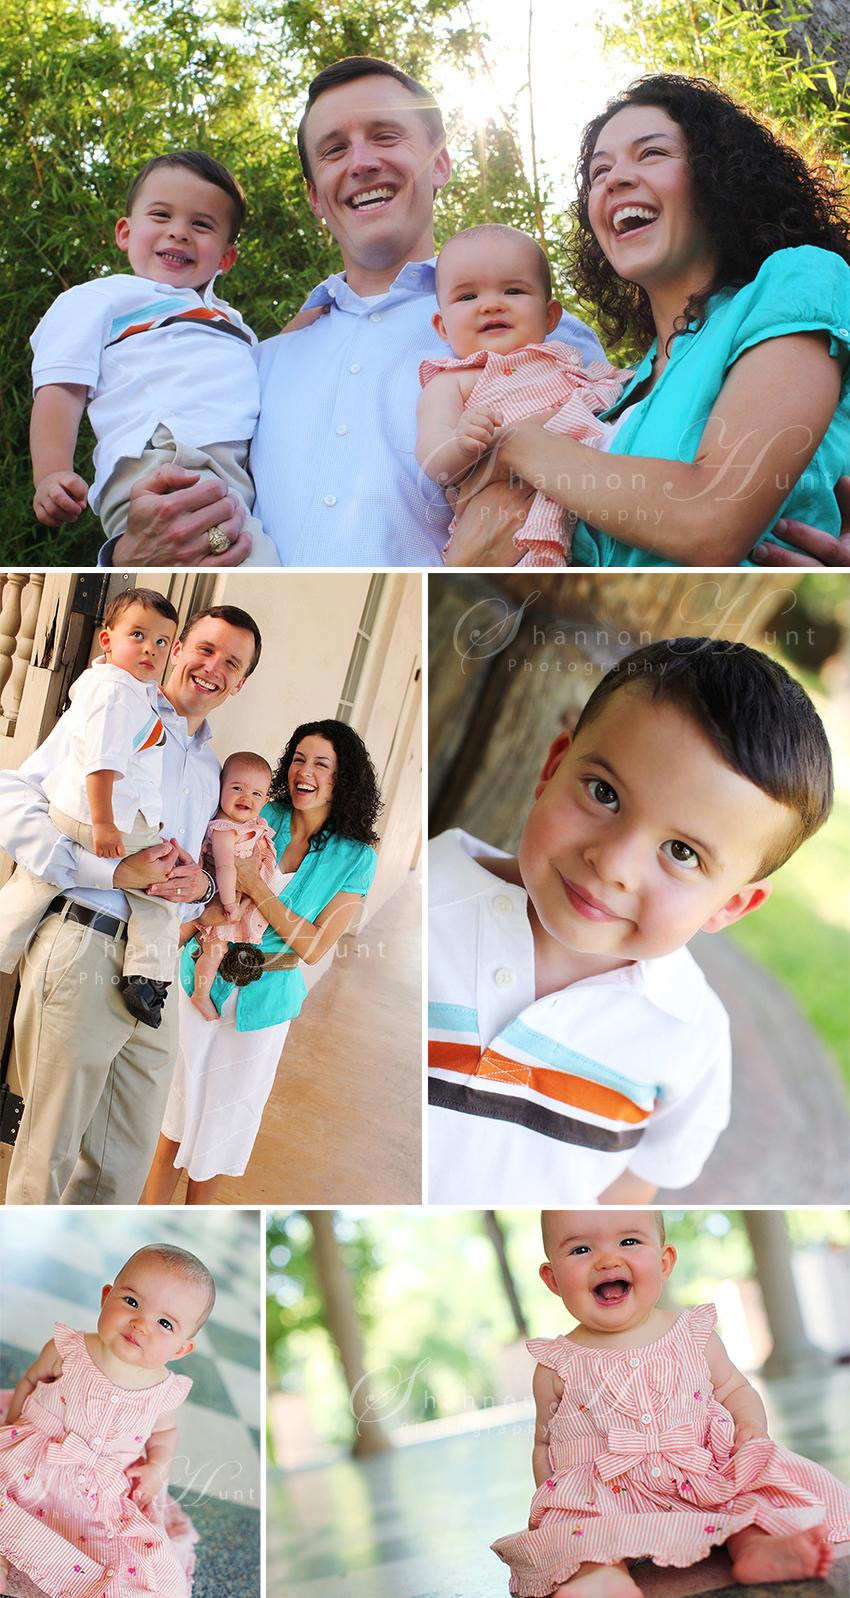 family Central Texas photography